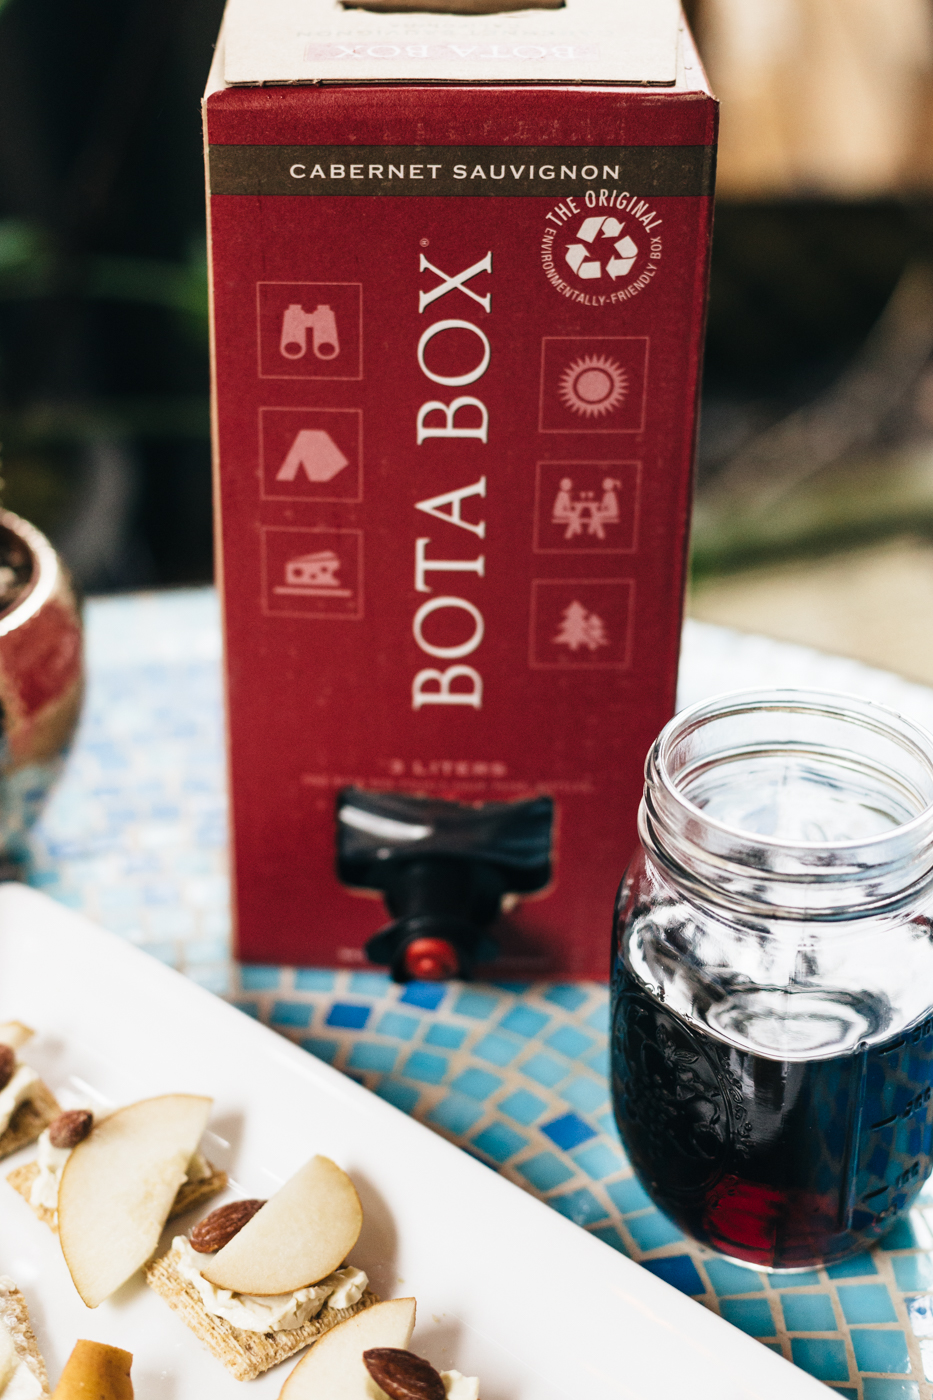 bota box wines, wfpk waterfront wednesday, the kentucky gent, kentucky blogger, good boxed wine